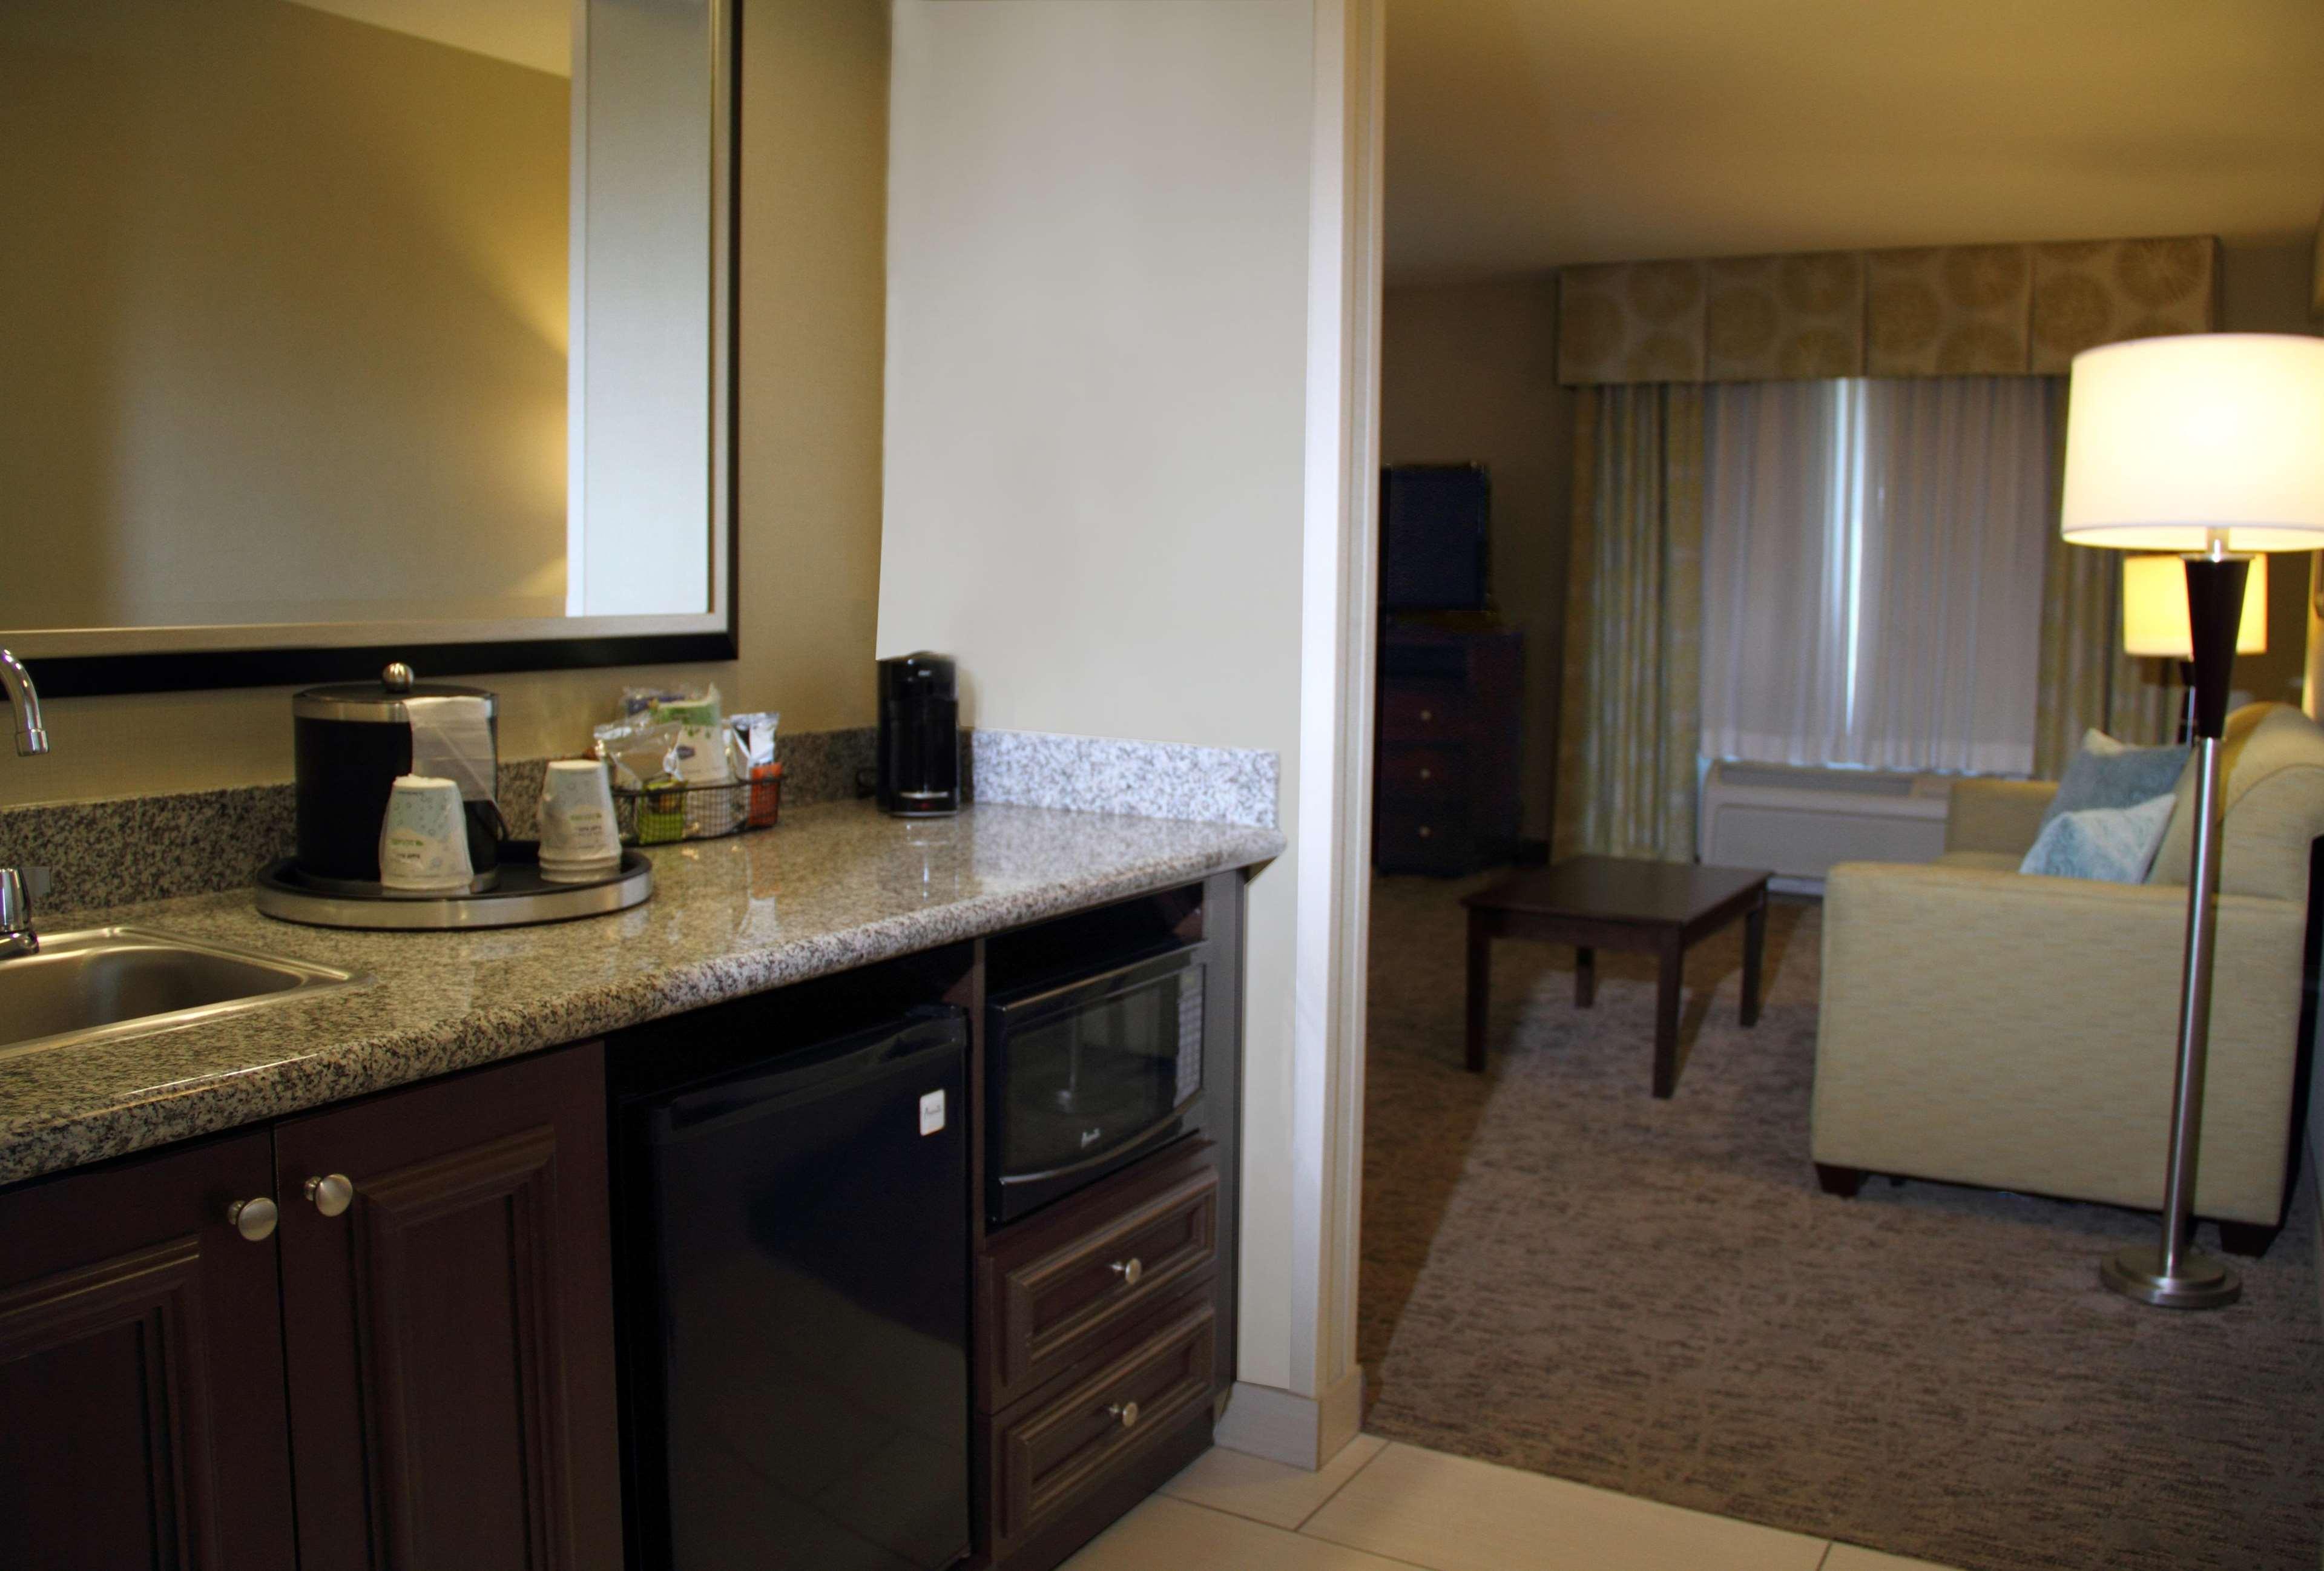 Hampton Inn & Suites Manteca image 2